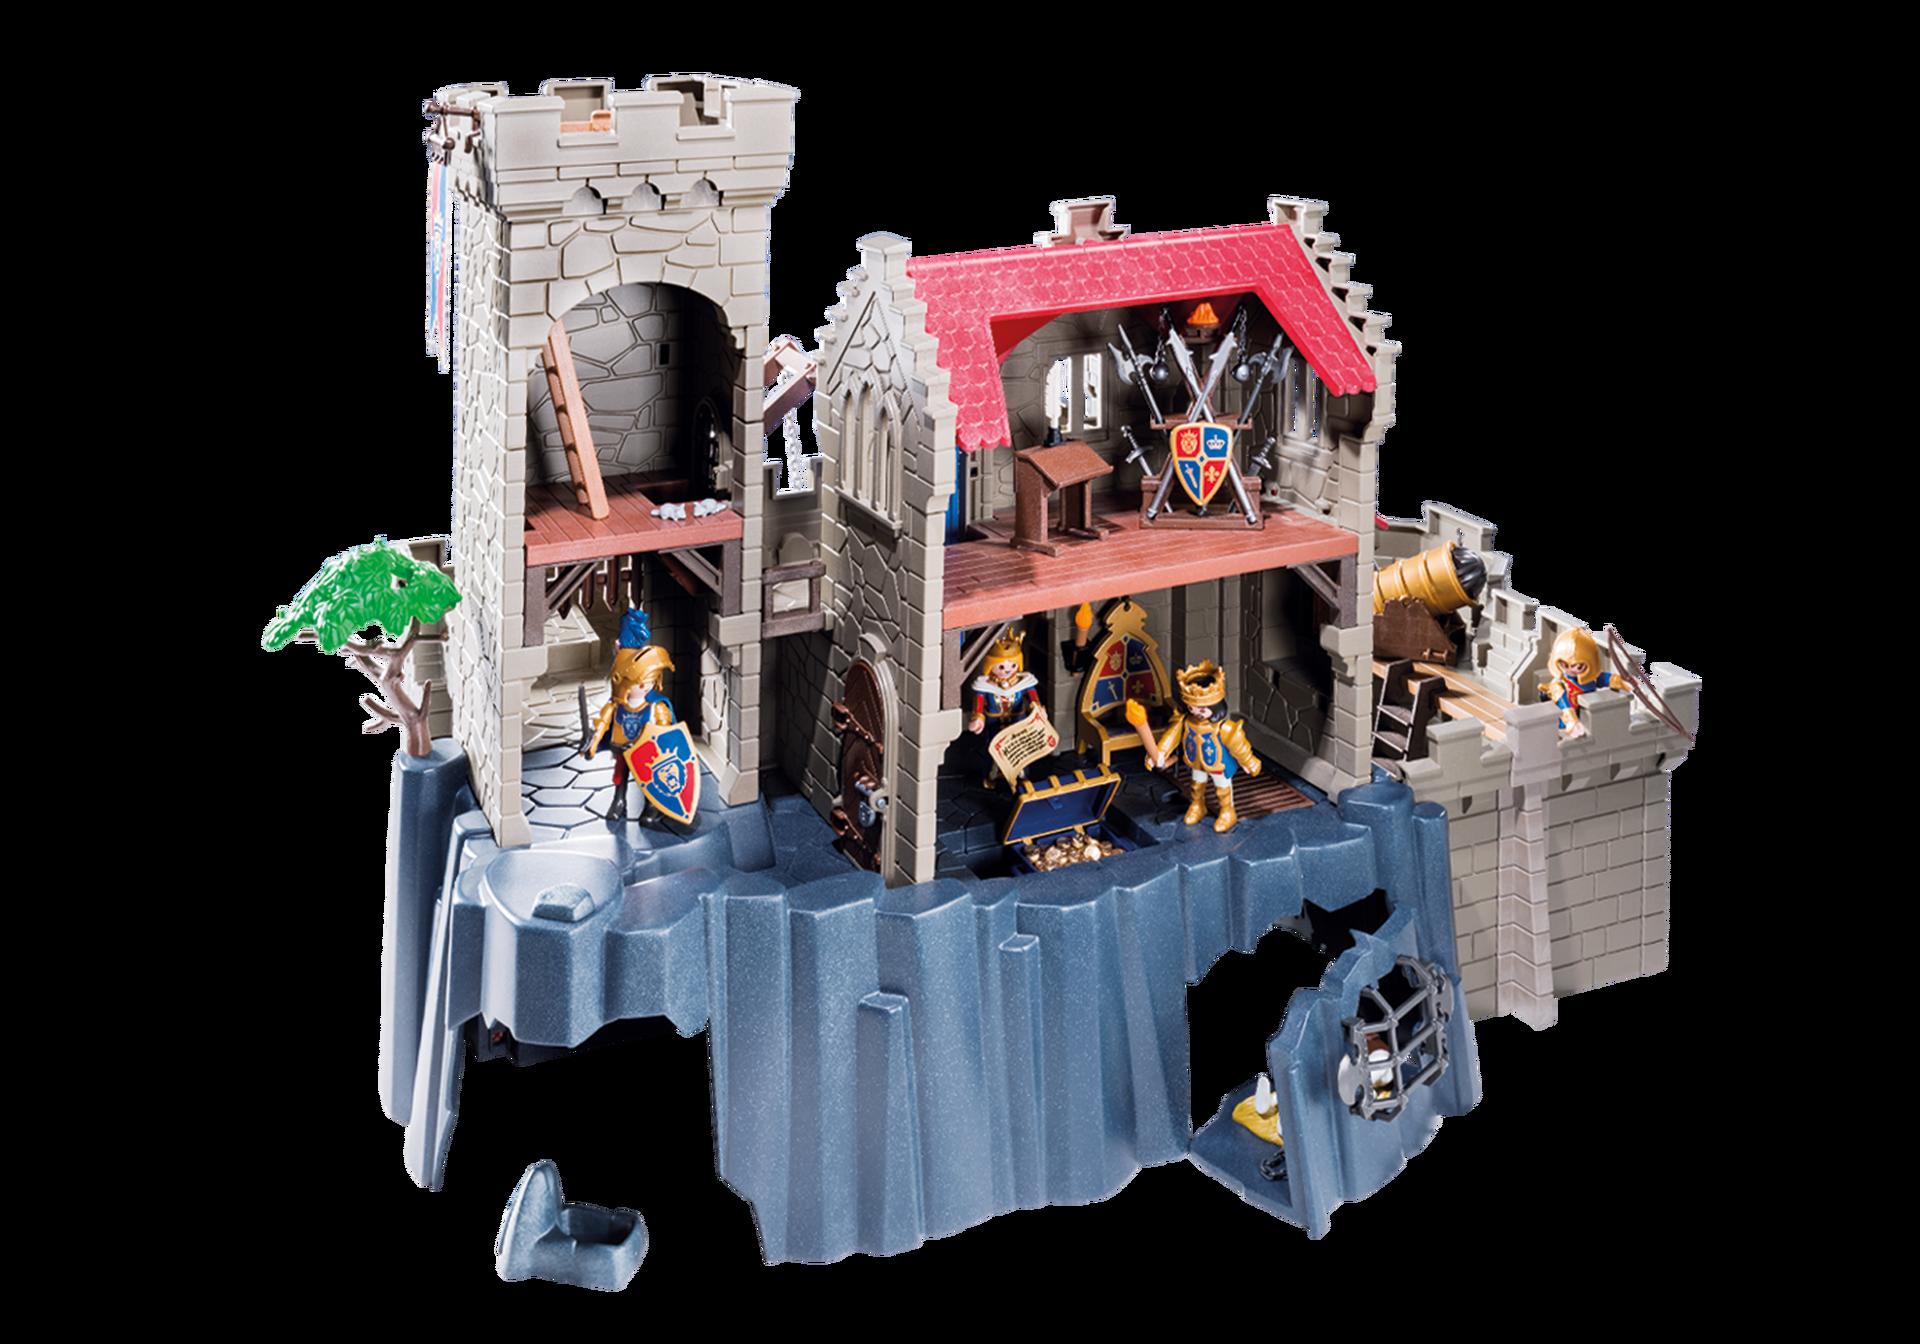 royal lion knight s castle 6000 playmobil united kingdom. Black Bedroom Furniture Sets. Home Design Ideas